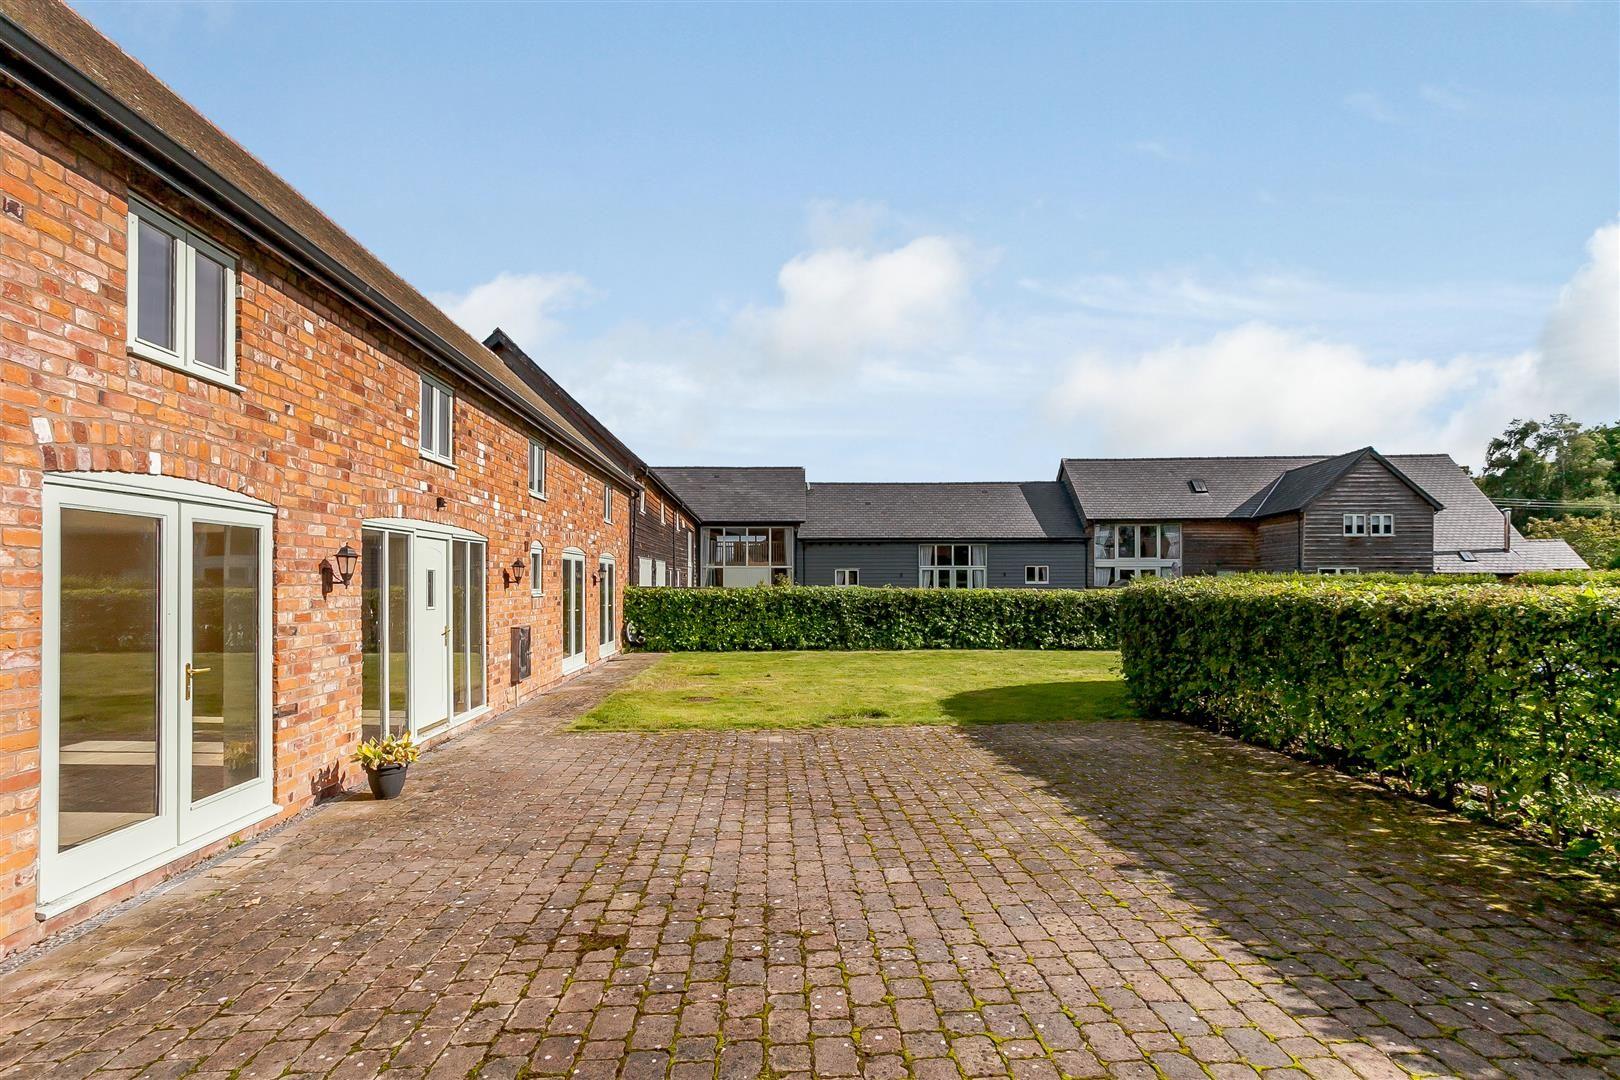 4 bed barn-conversion for sale in Pembridge 17